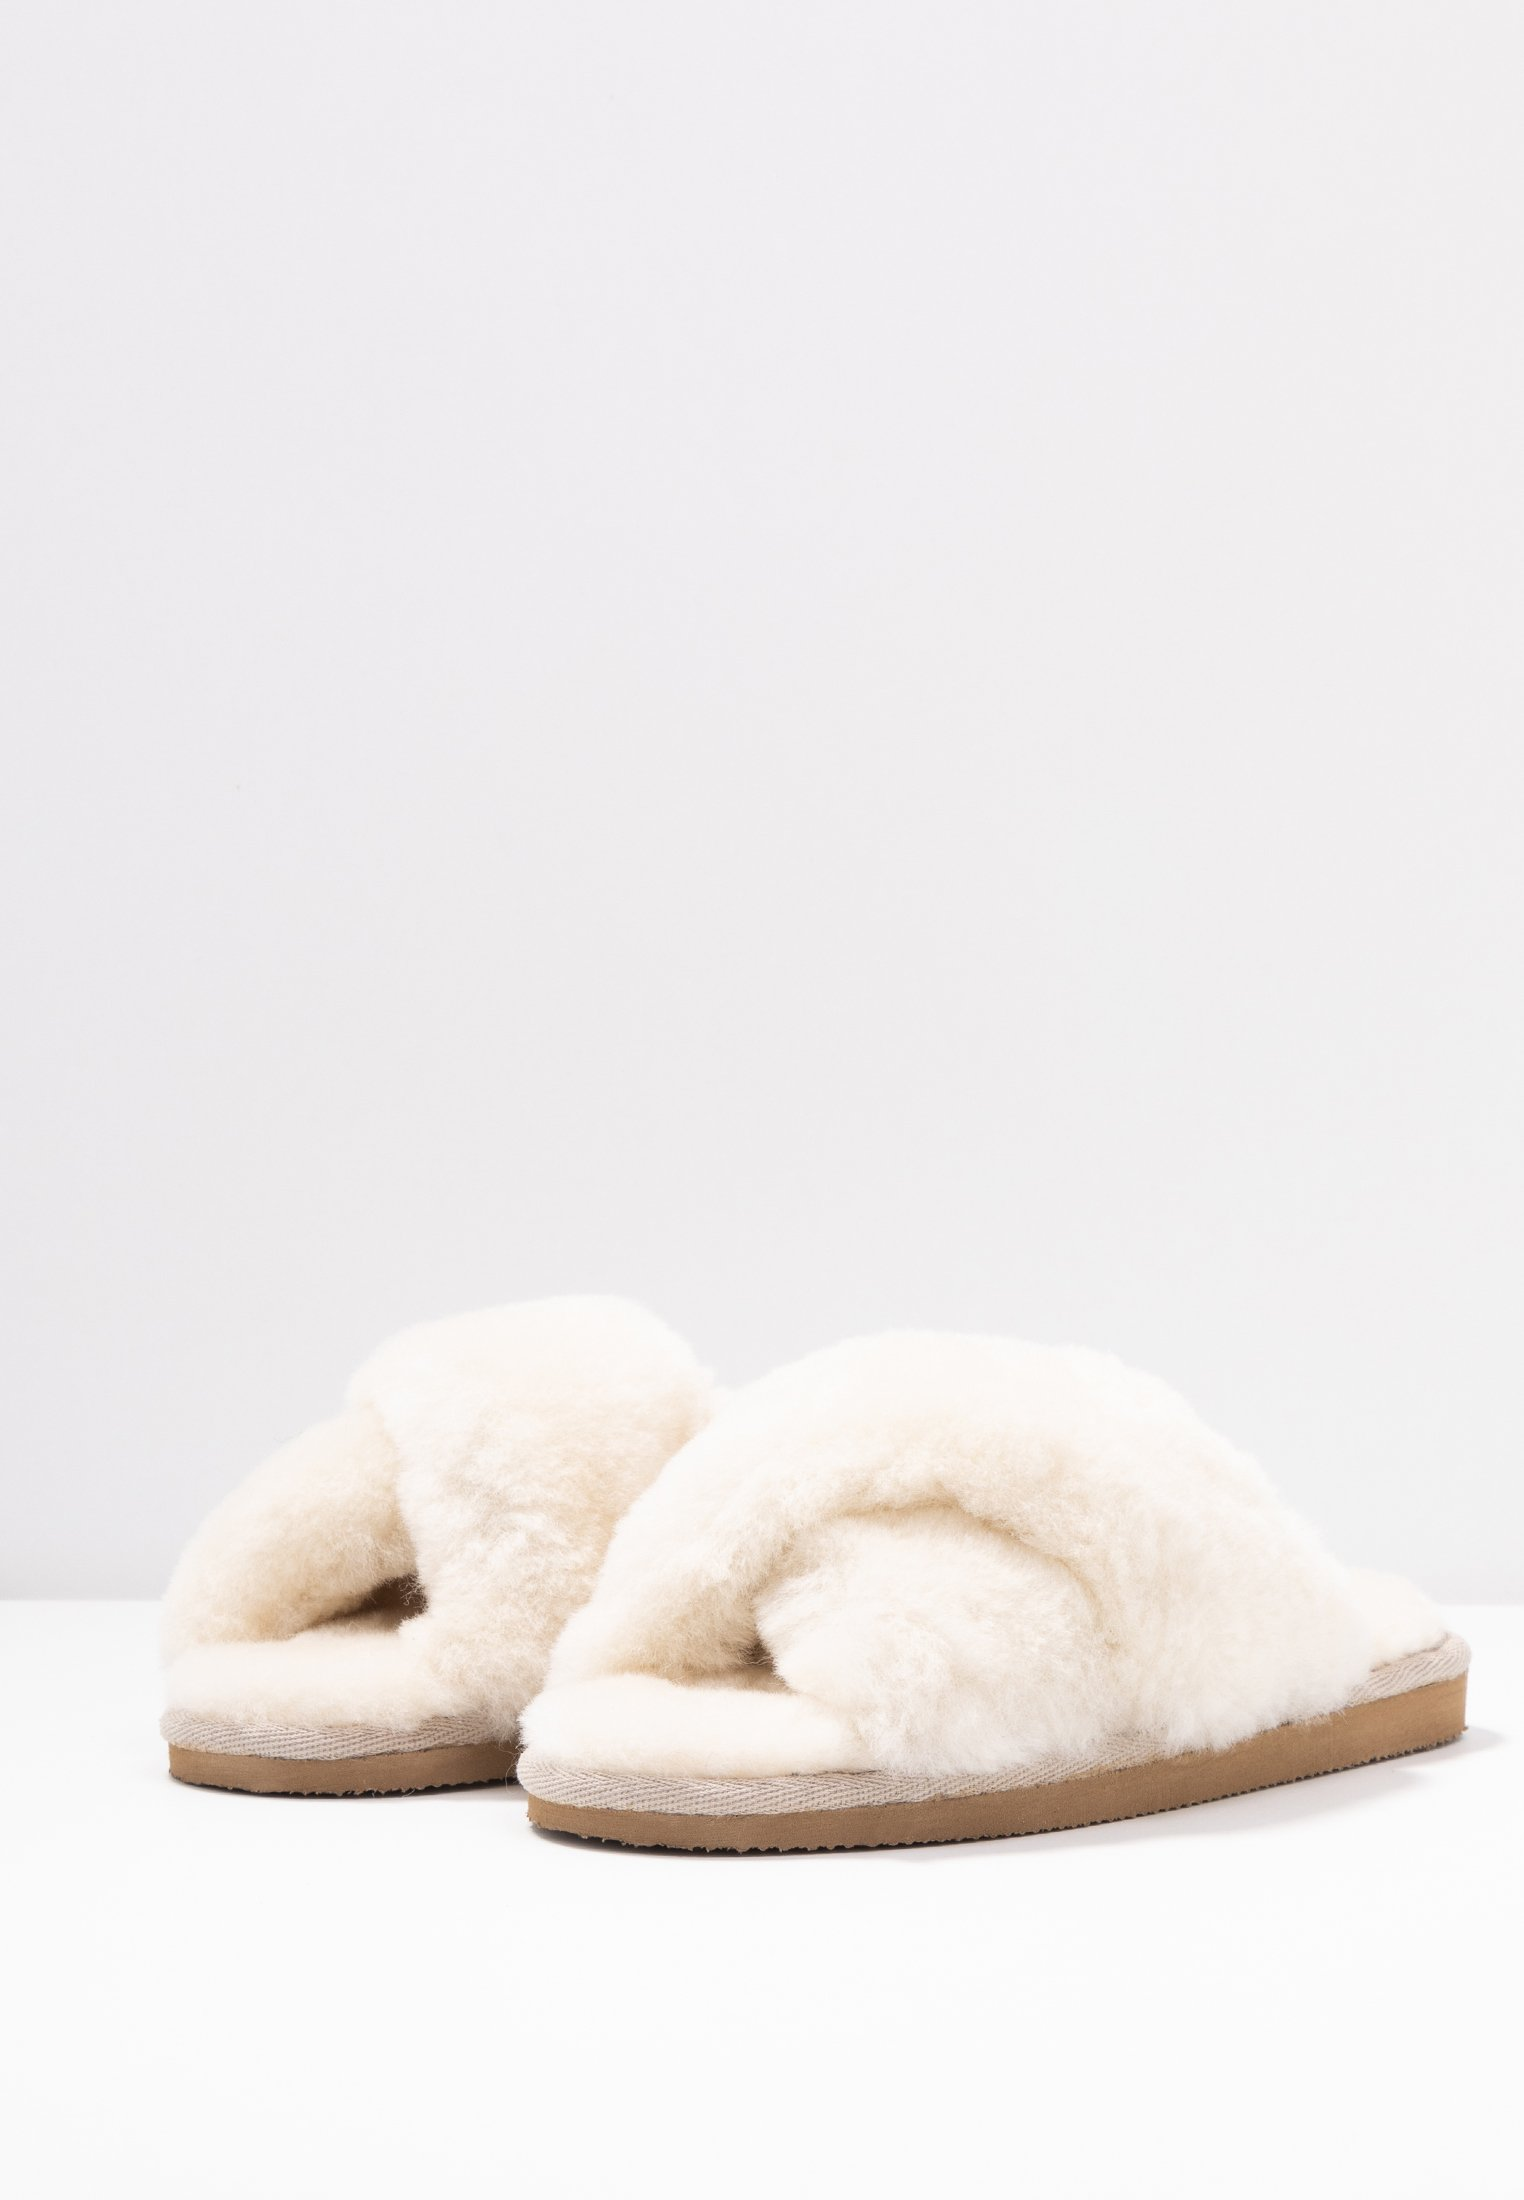 Shepherd Lovisa - Hausschuh Creme/offwhite